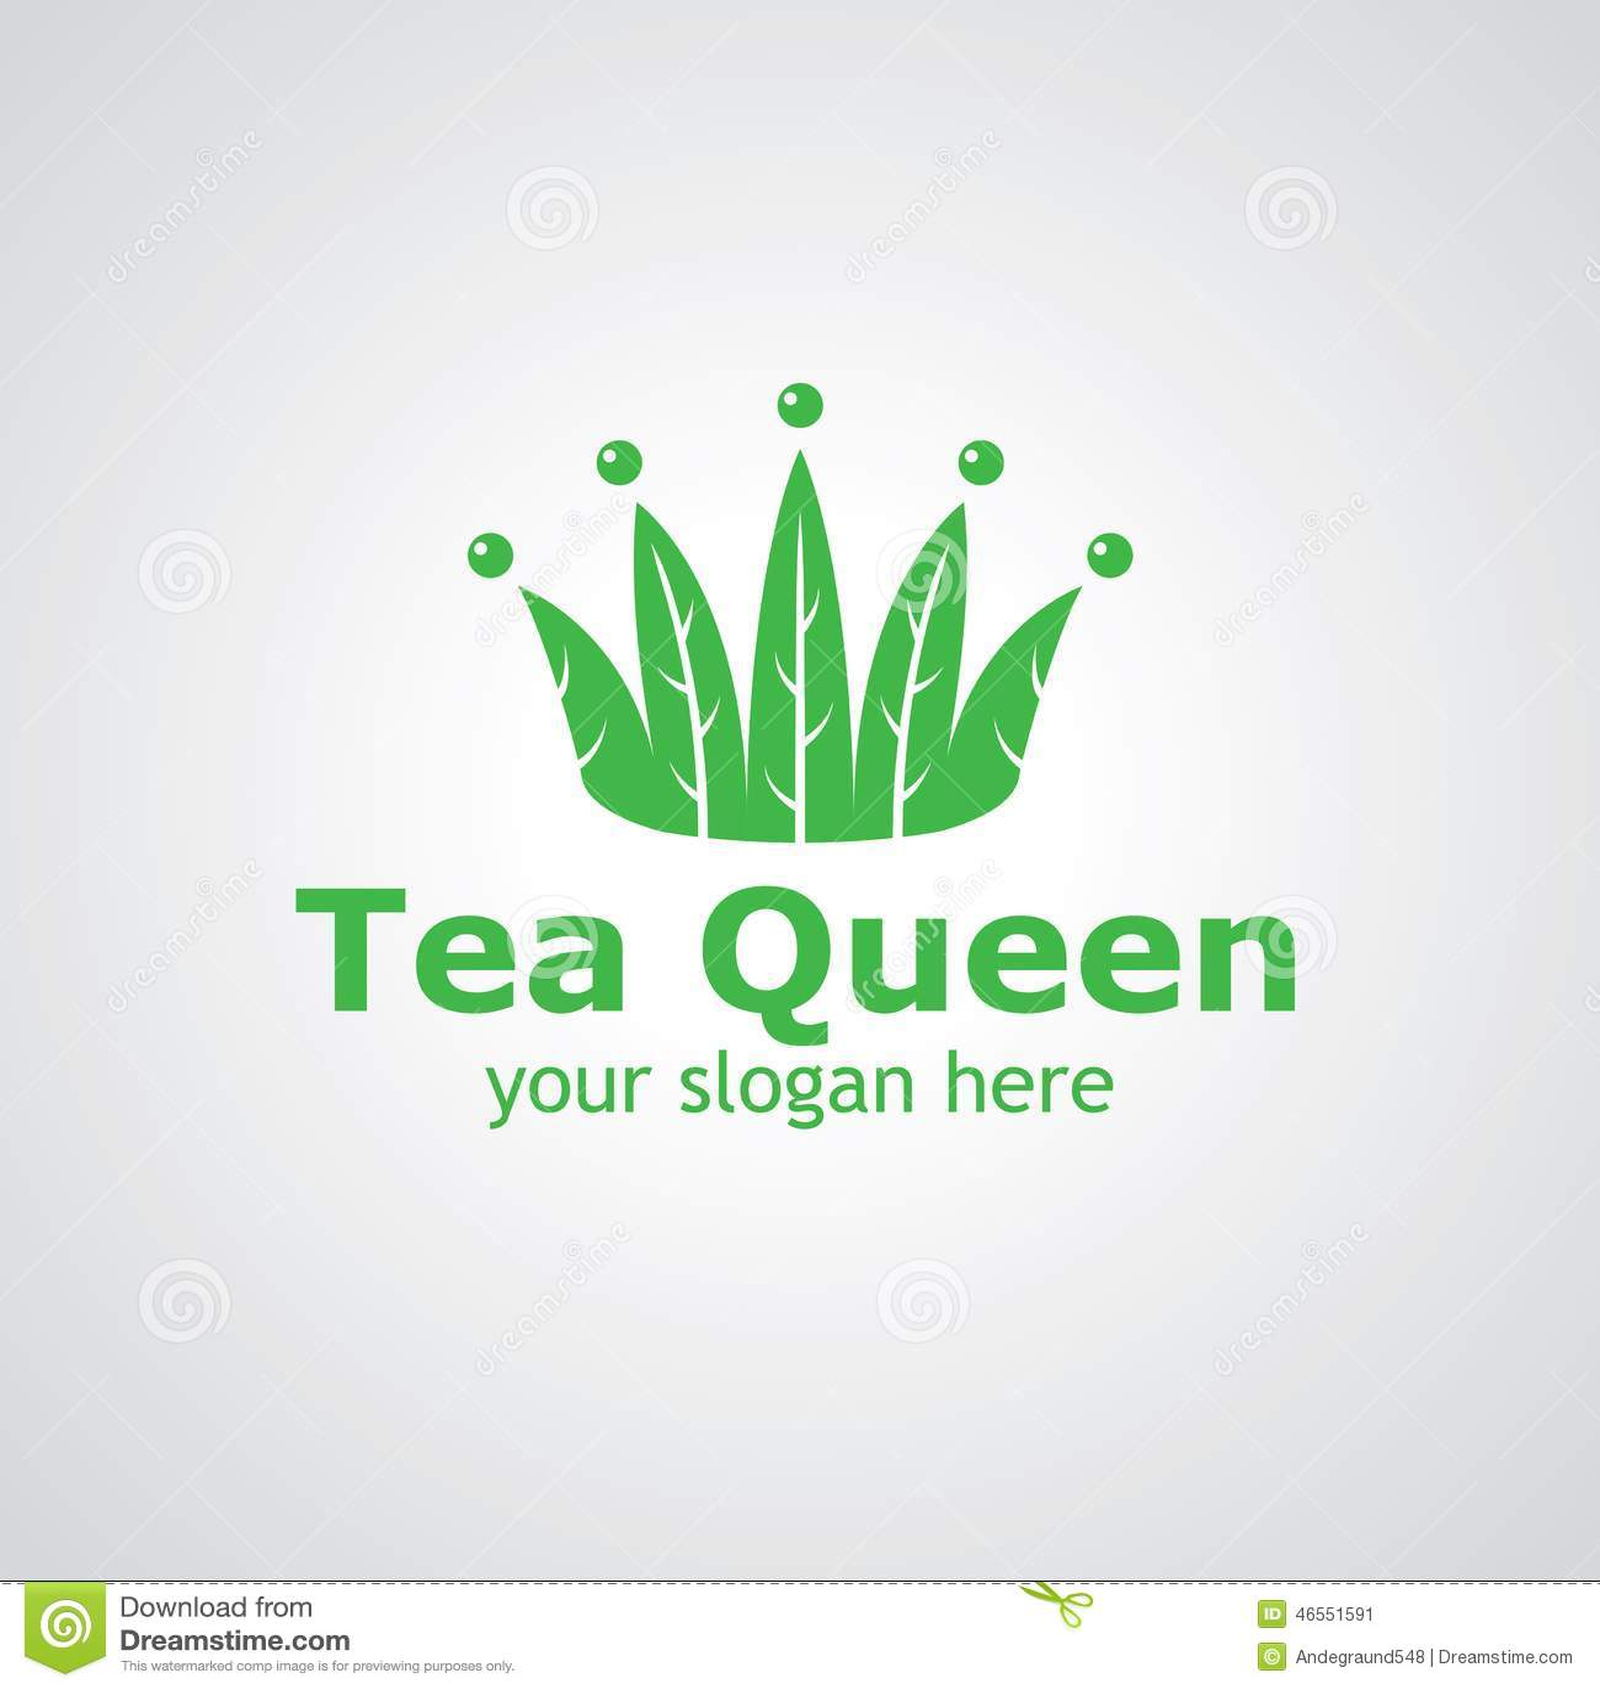 Queen crown logo design - photo#26